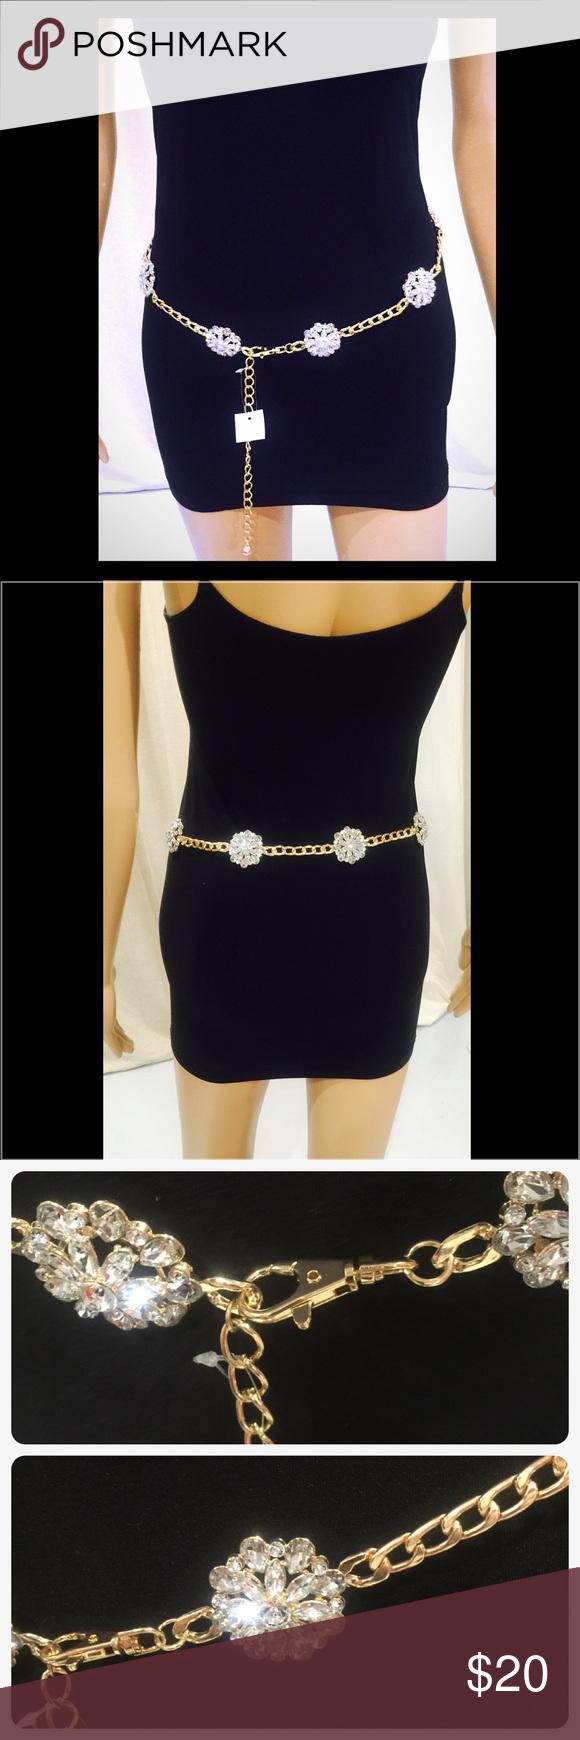 Chain Gold Belt w/Diamond Flower Design Chain Gold Belt w/Diamond Flower Design NWOT. Accessories Belts